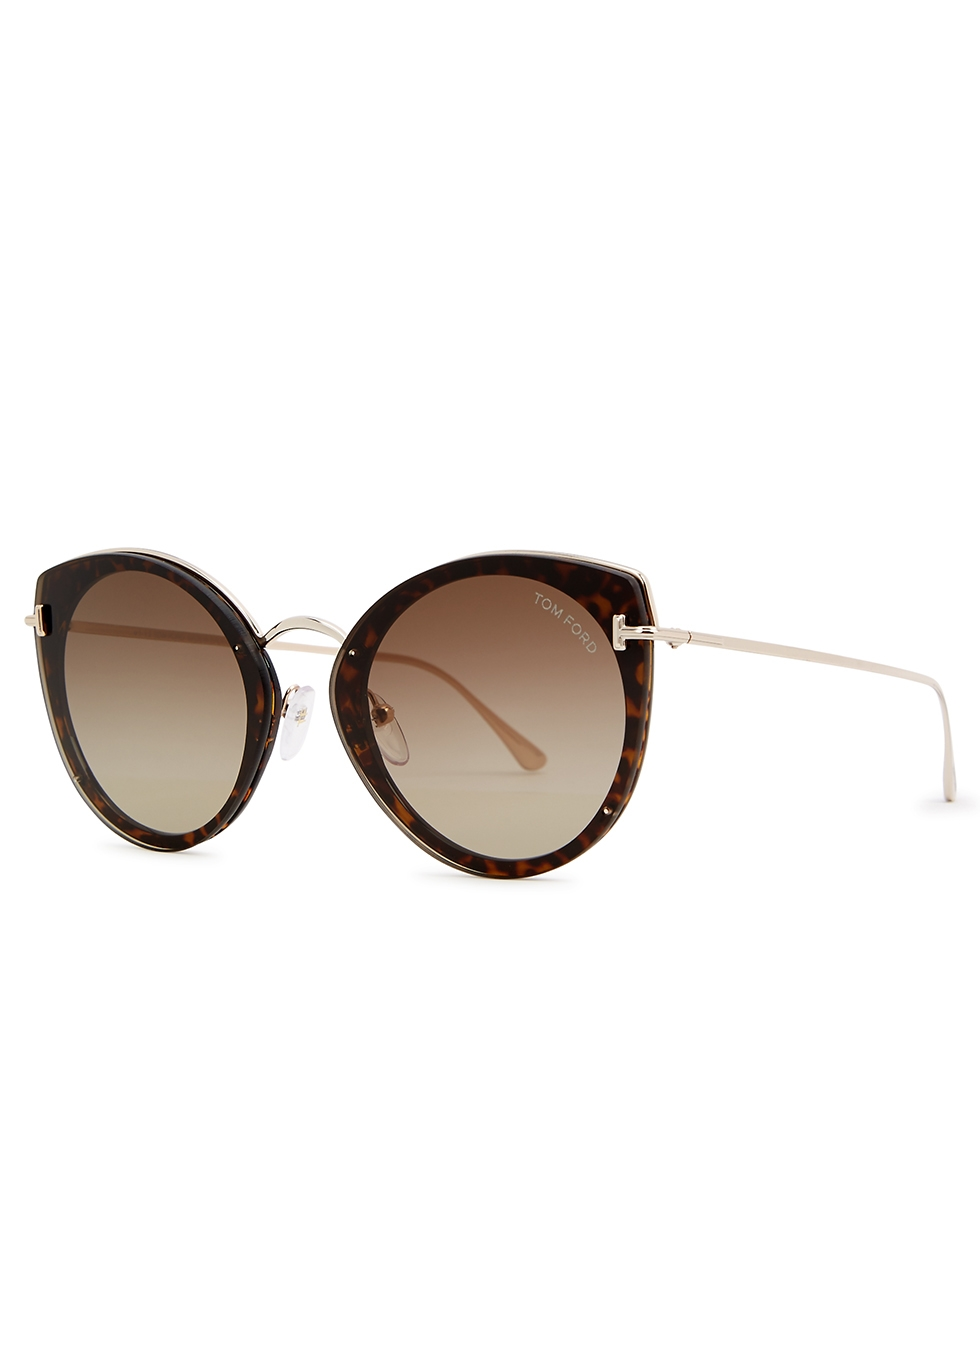 Jess tortoiseshell round-frame sunglasses - Tom Ford Eyewear